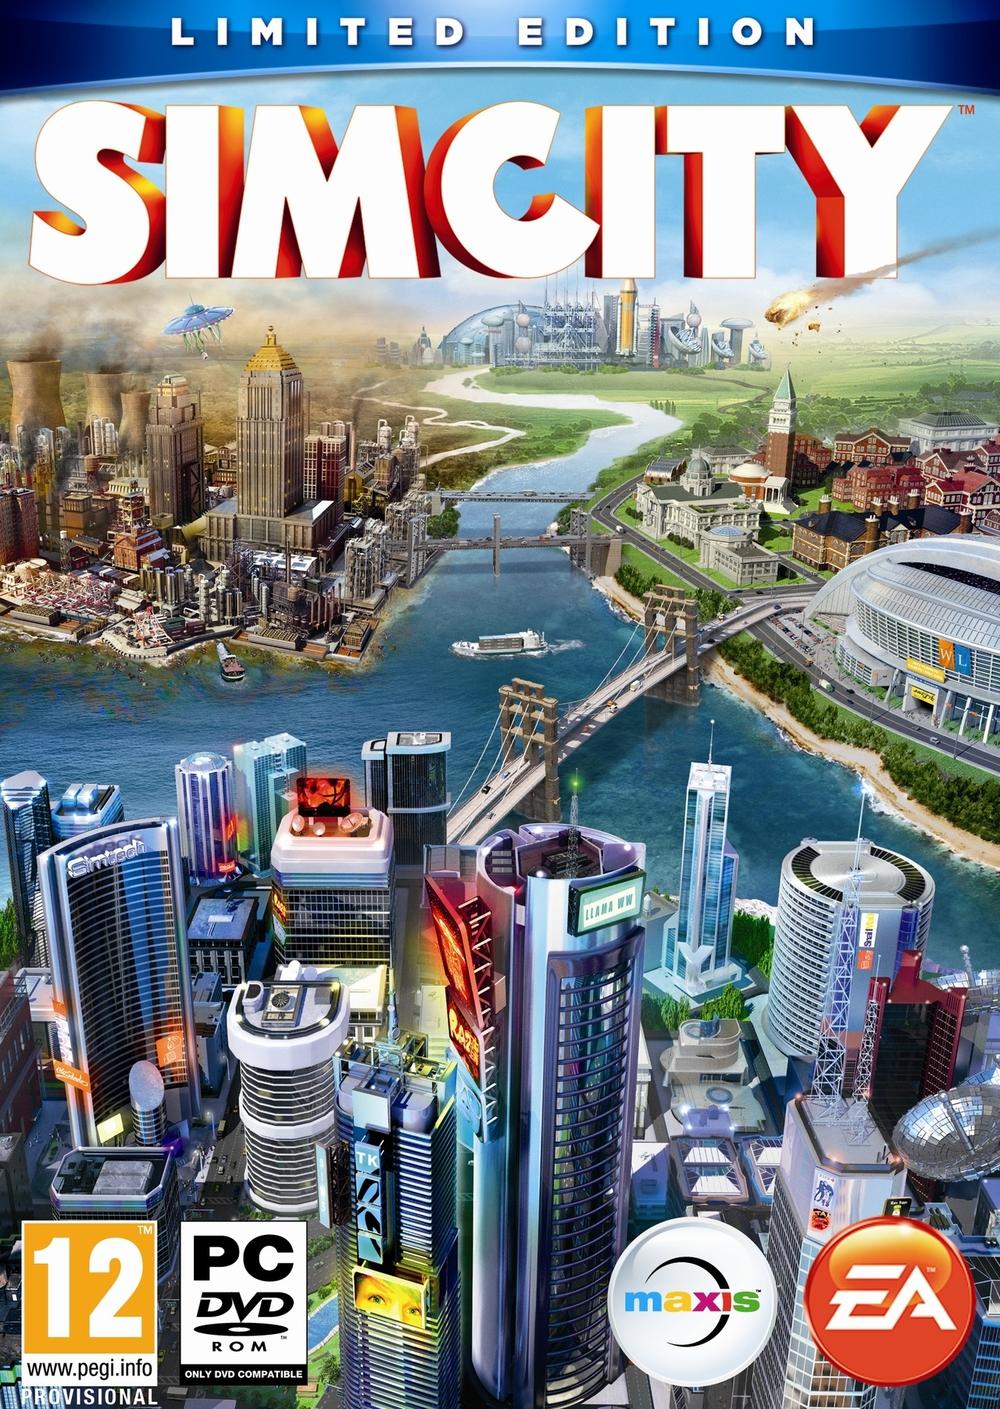 simcity-cover.jpg